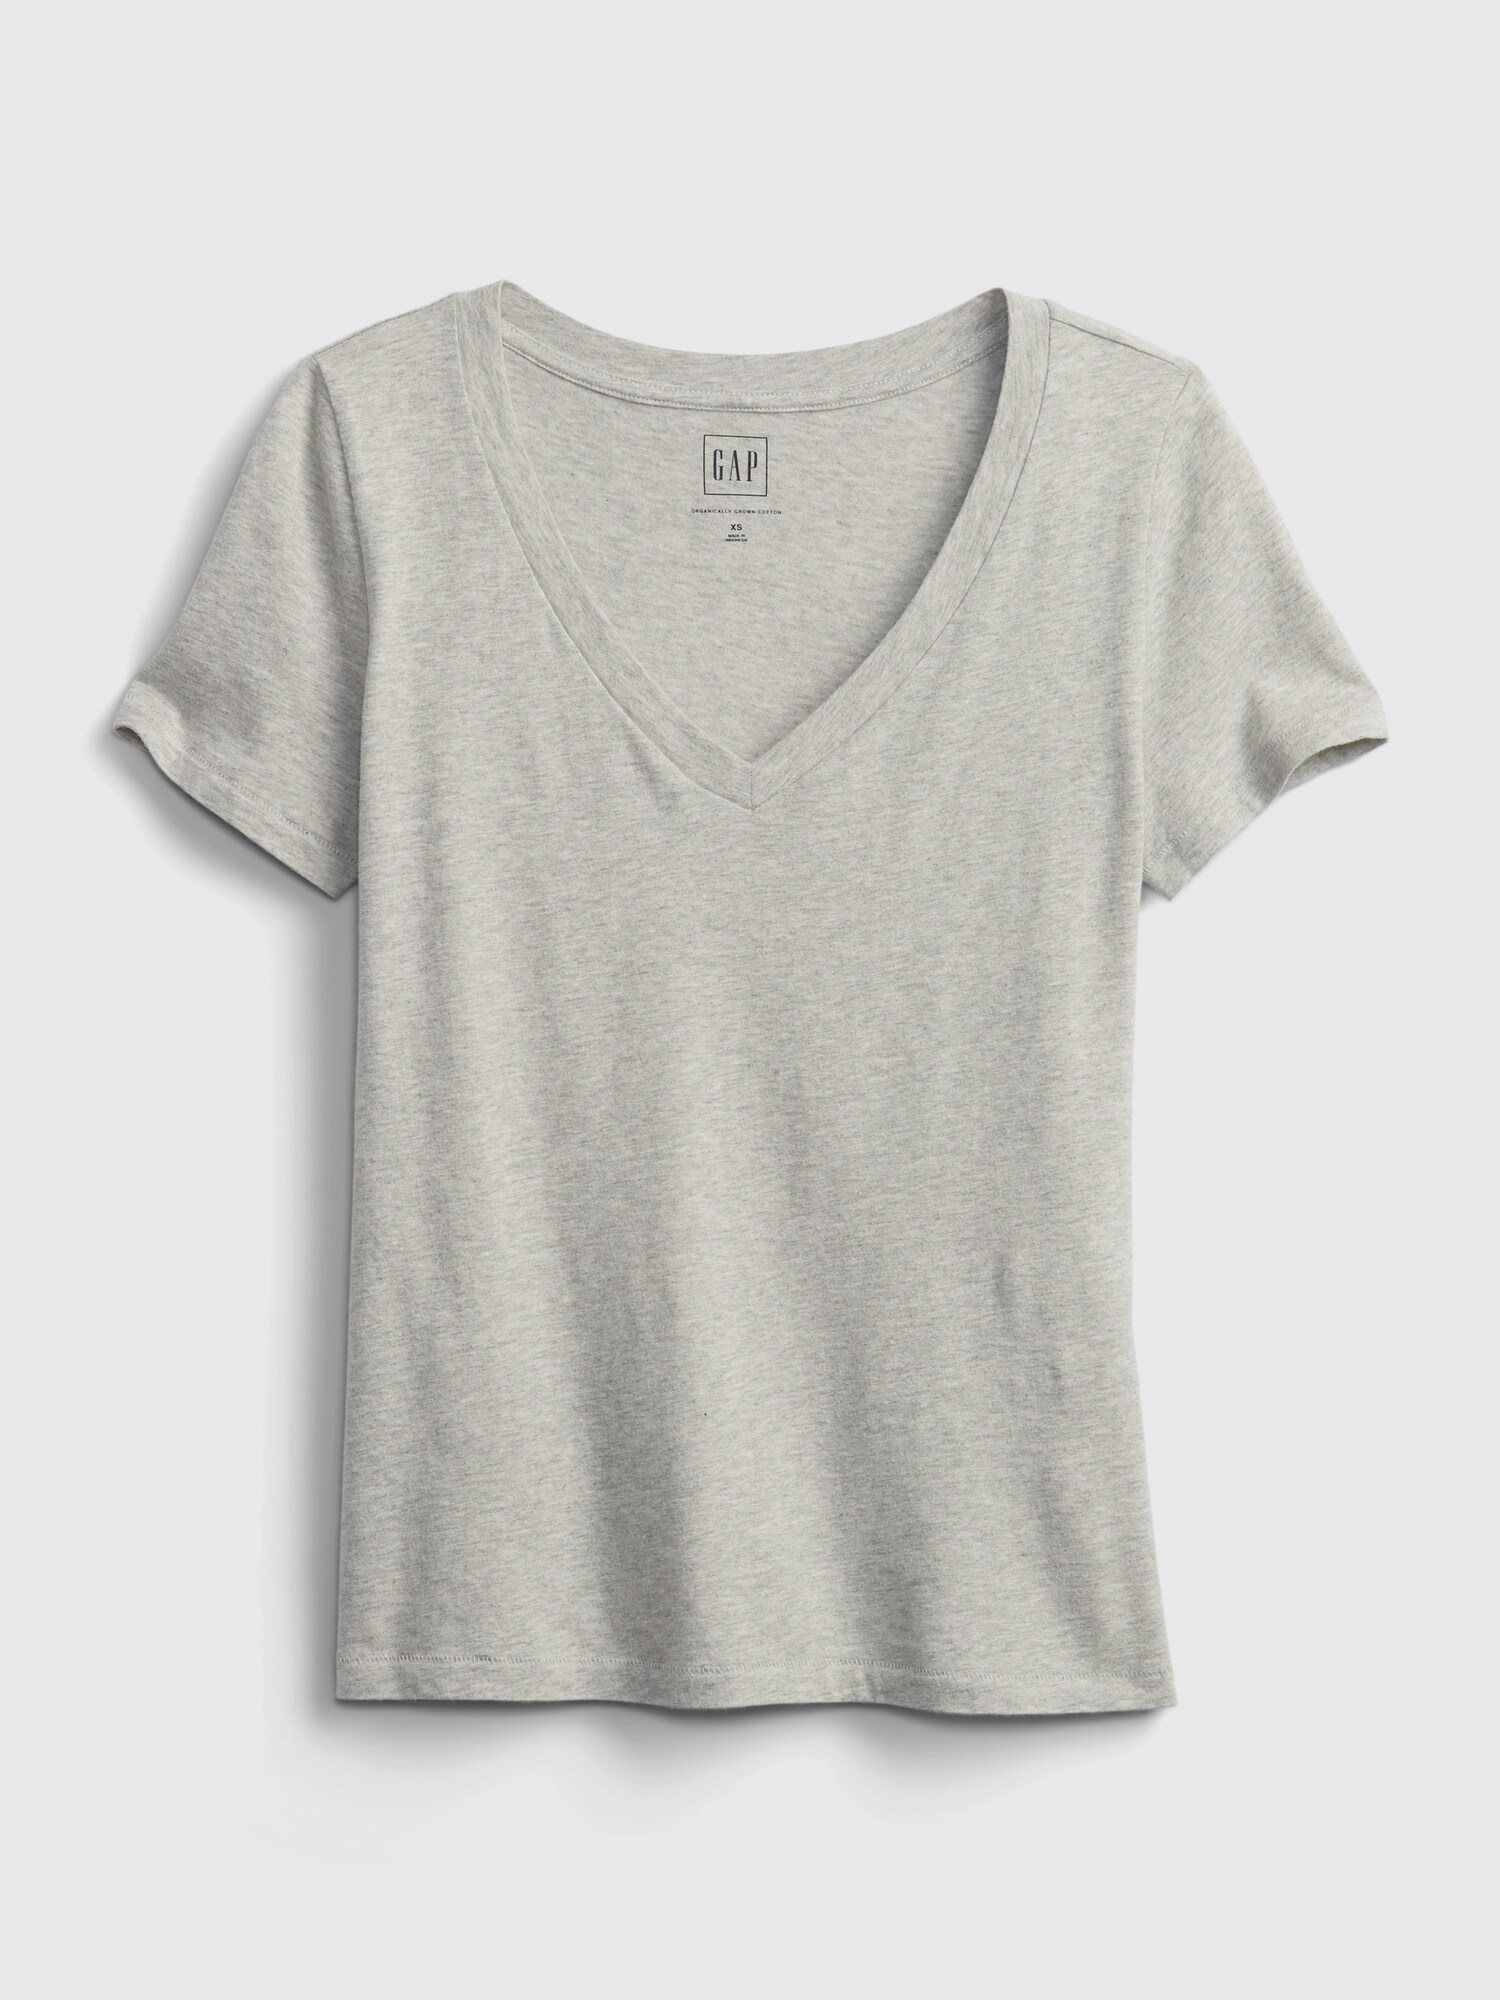 GAP grigio maglietta Cotton Vintage